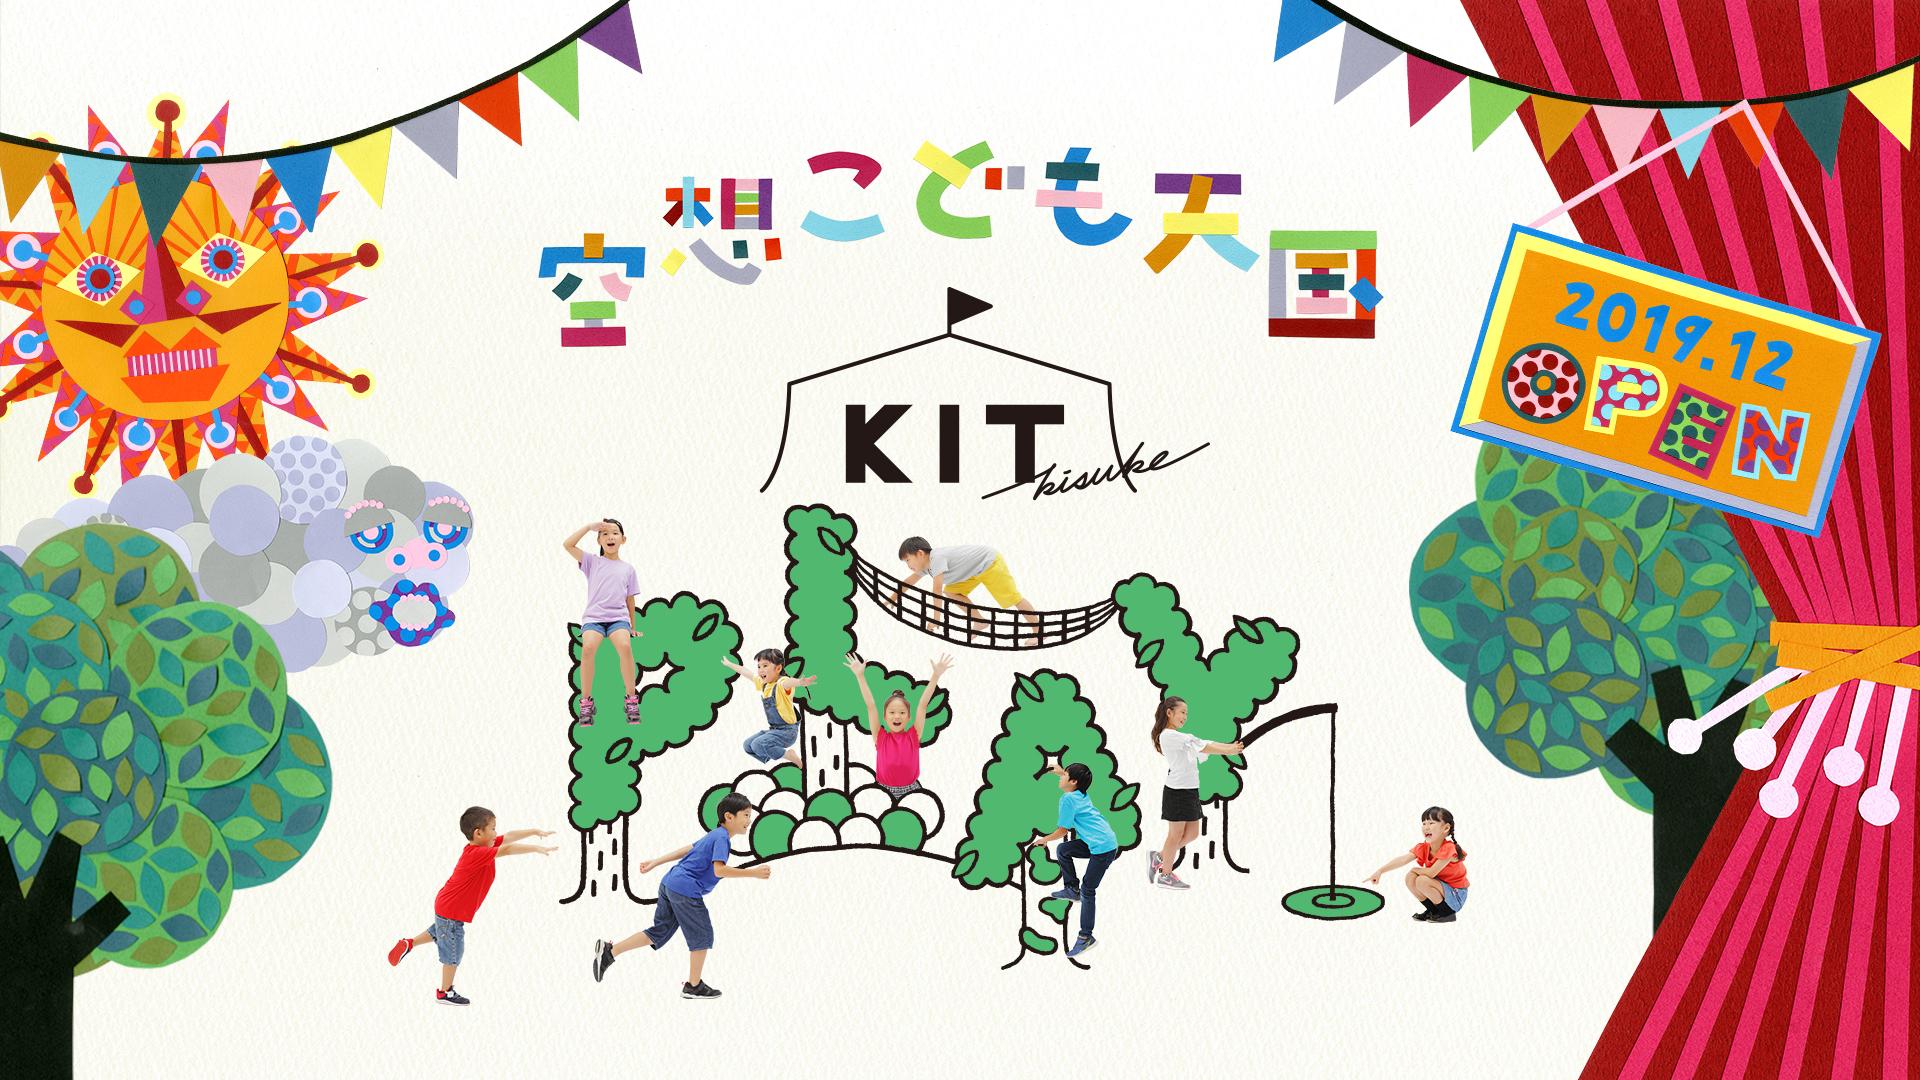 新施設「KIT PLAY」特設サイト公開中